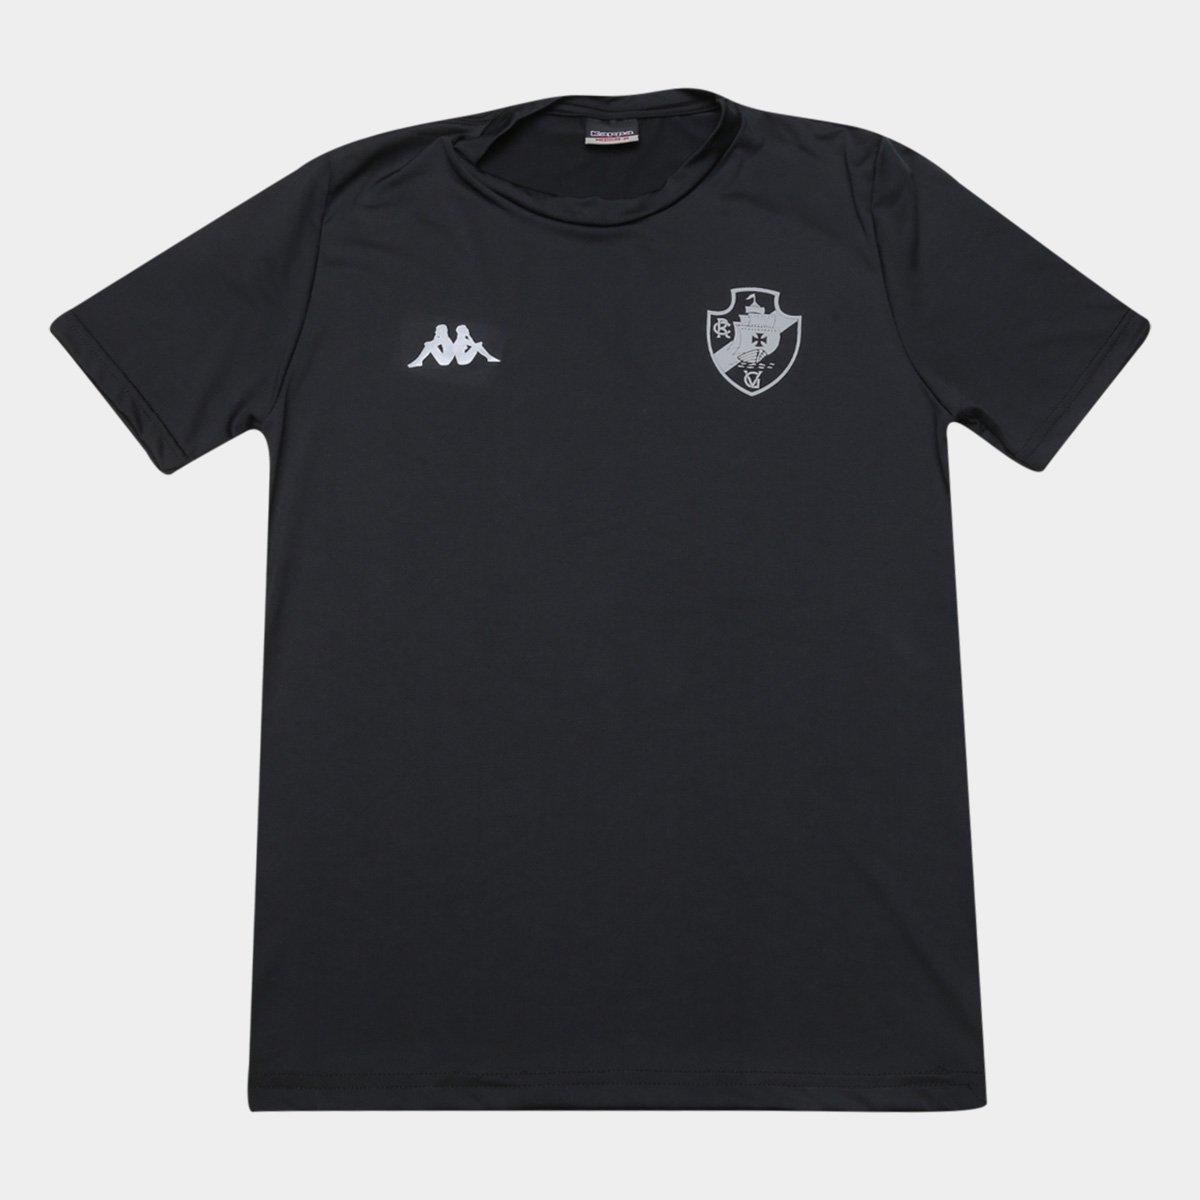 Camisa Térmica Vasco Preta - Kappa 2020